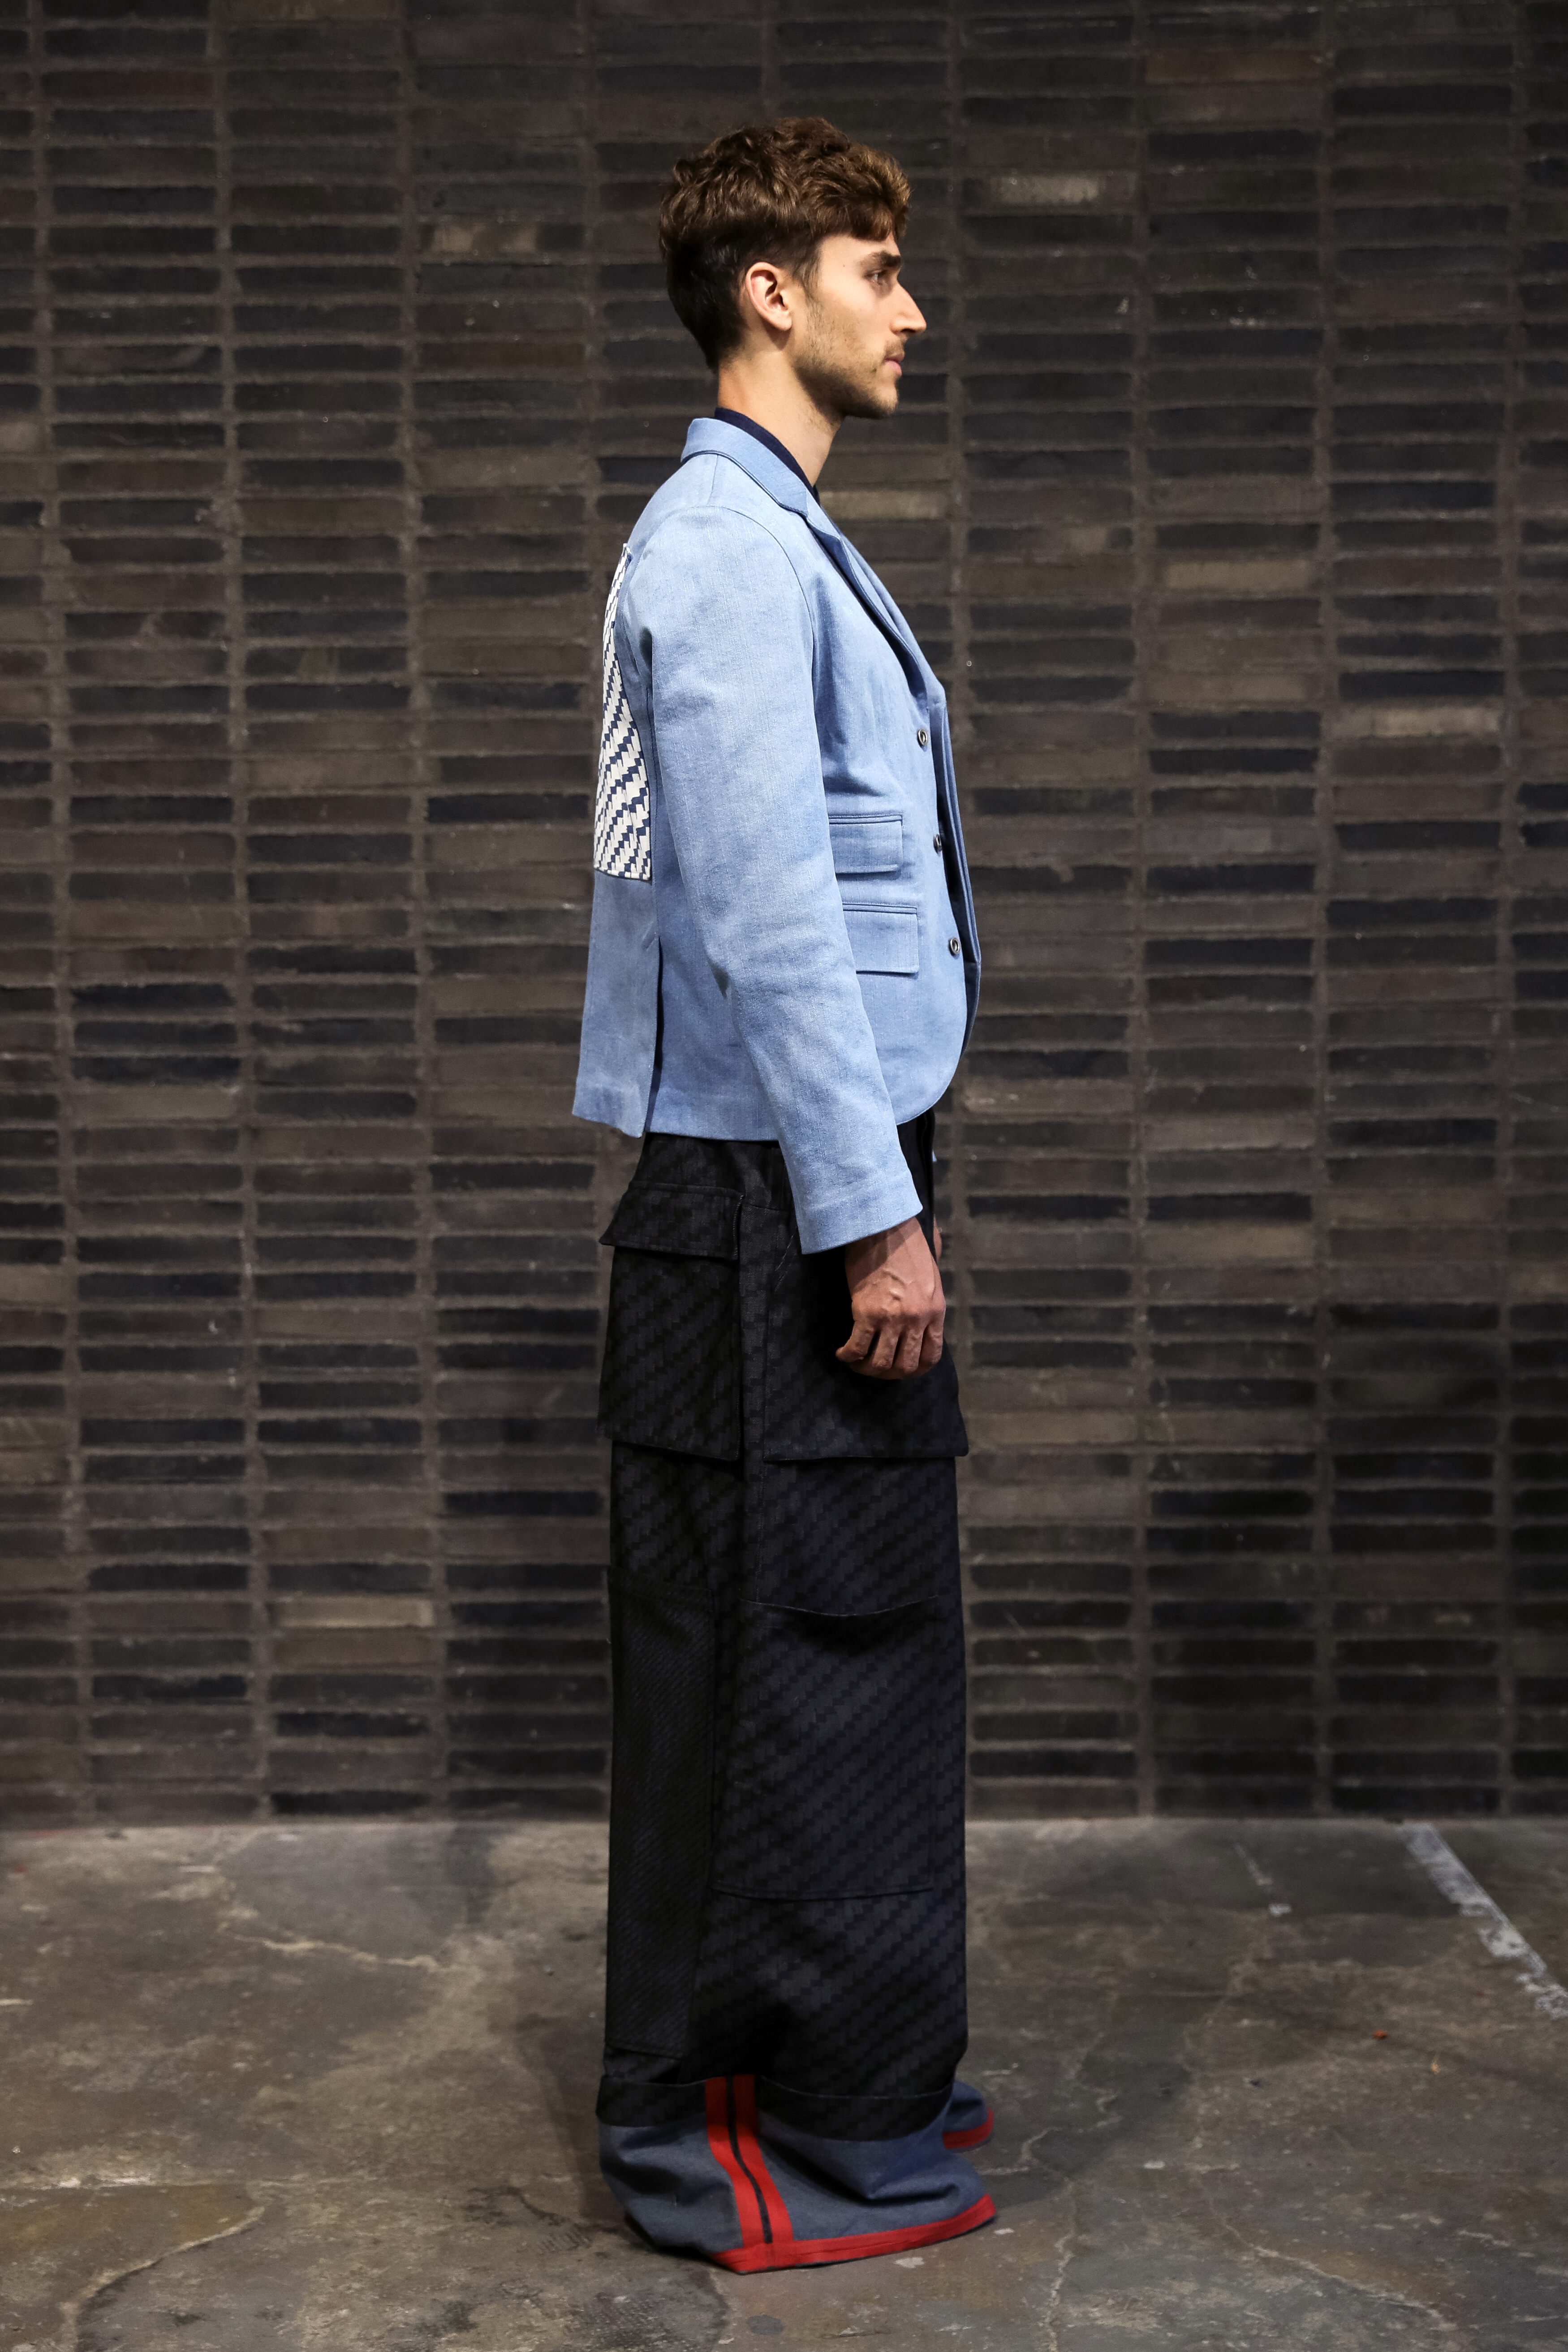 Haeyeong Jeon from Istituto Marangoni Florence -